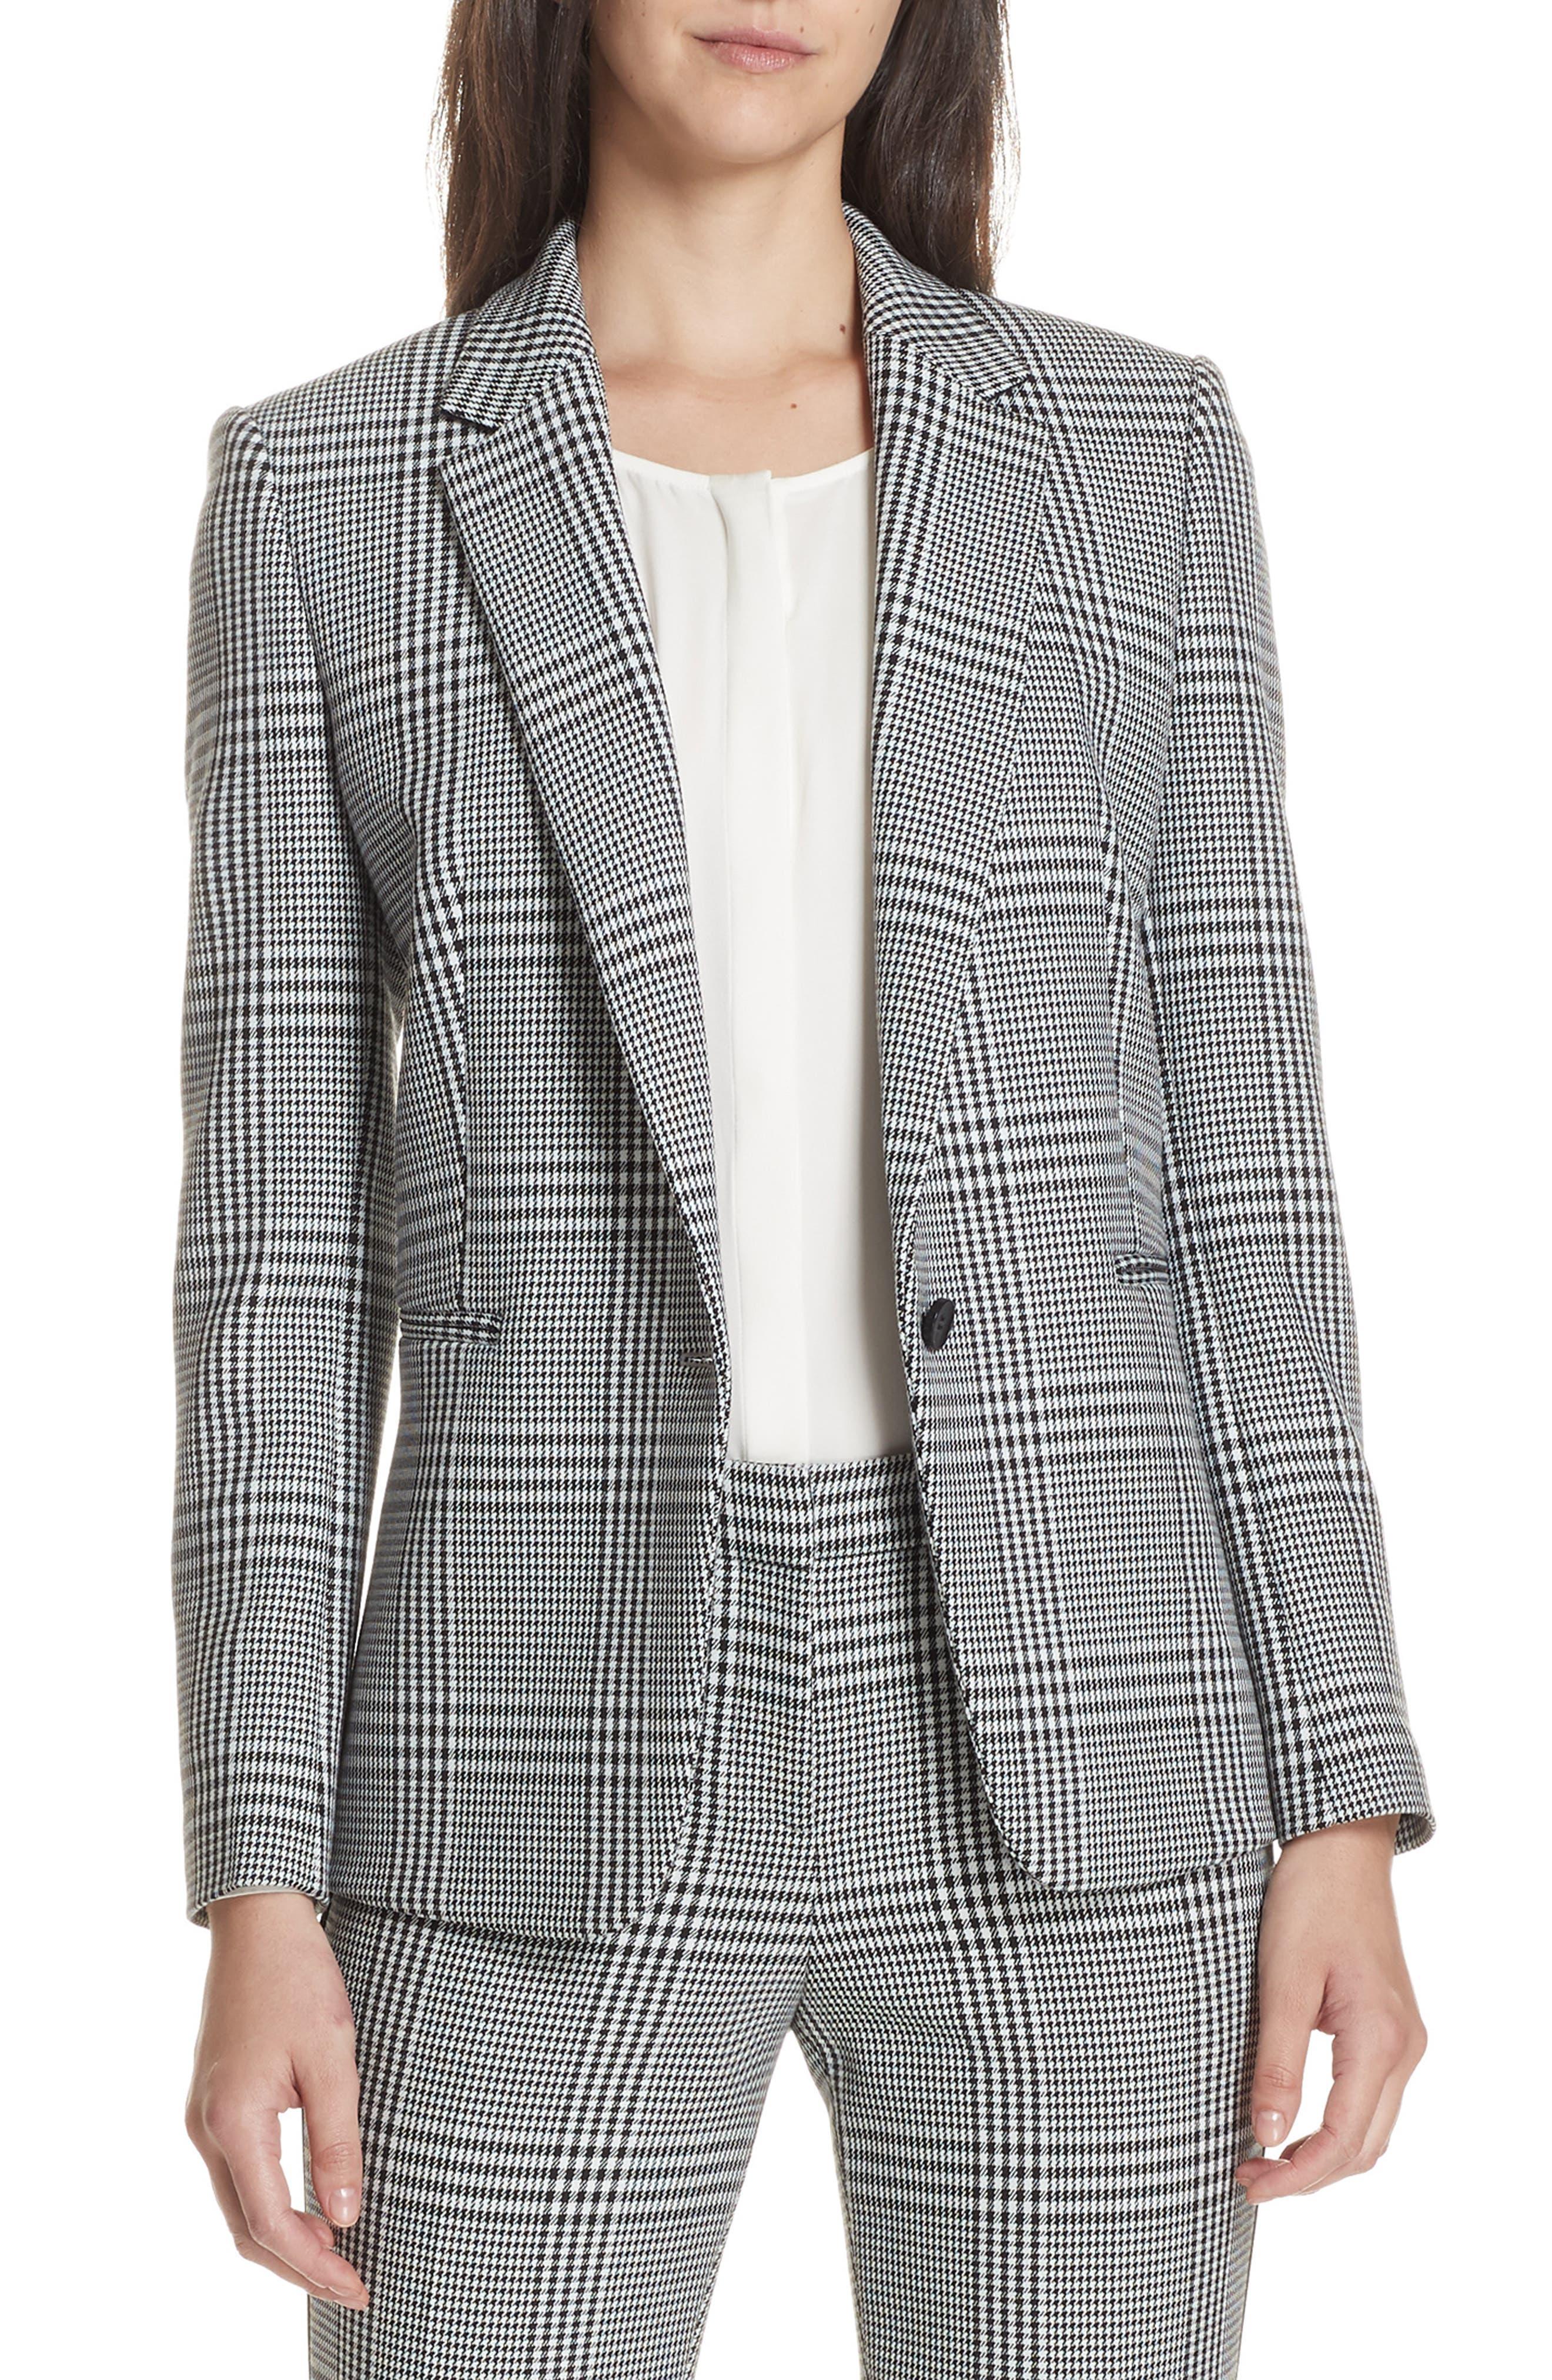 Jemaromina Glen Plaid Suit Jacket,                         Main,                         color, 020